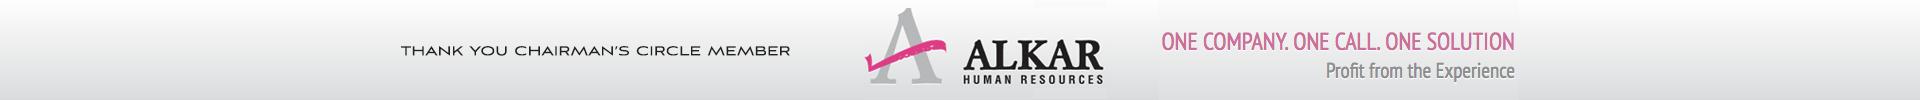 home-page-business-spotlight-Alkar